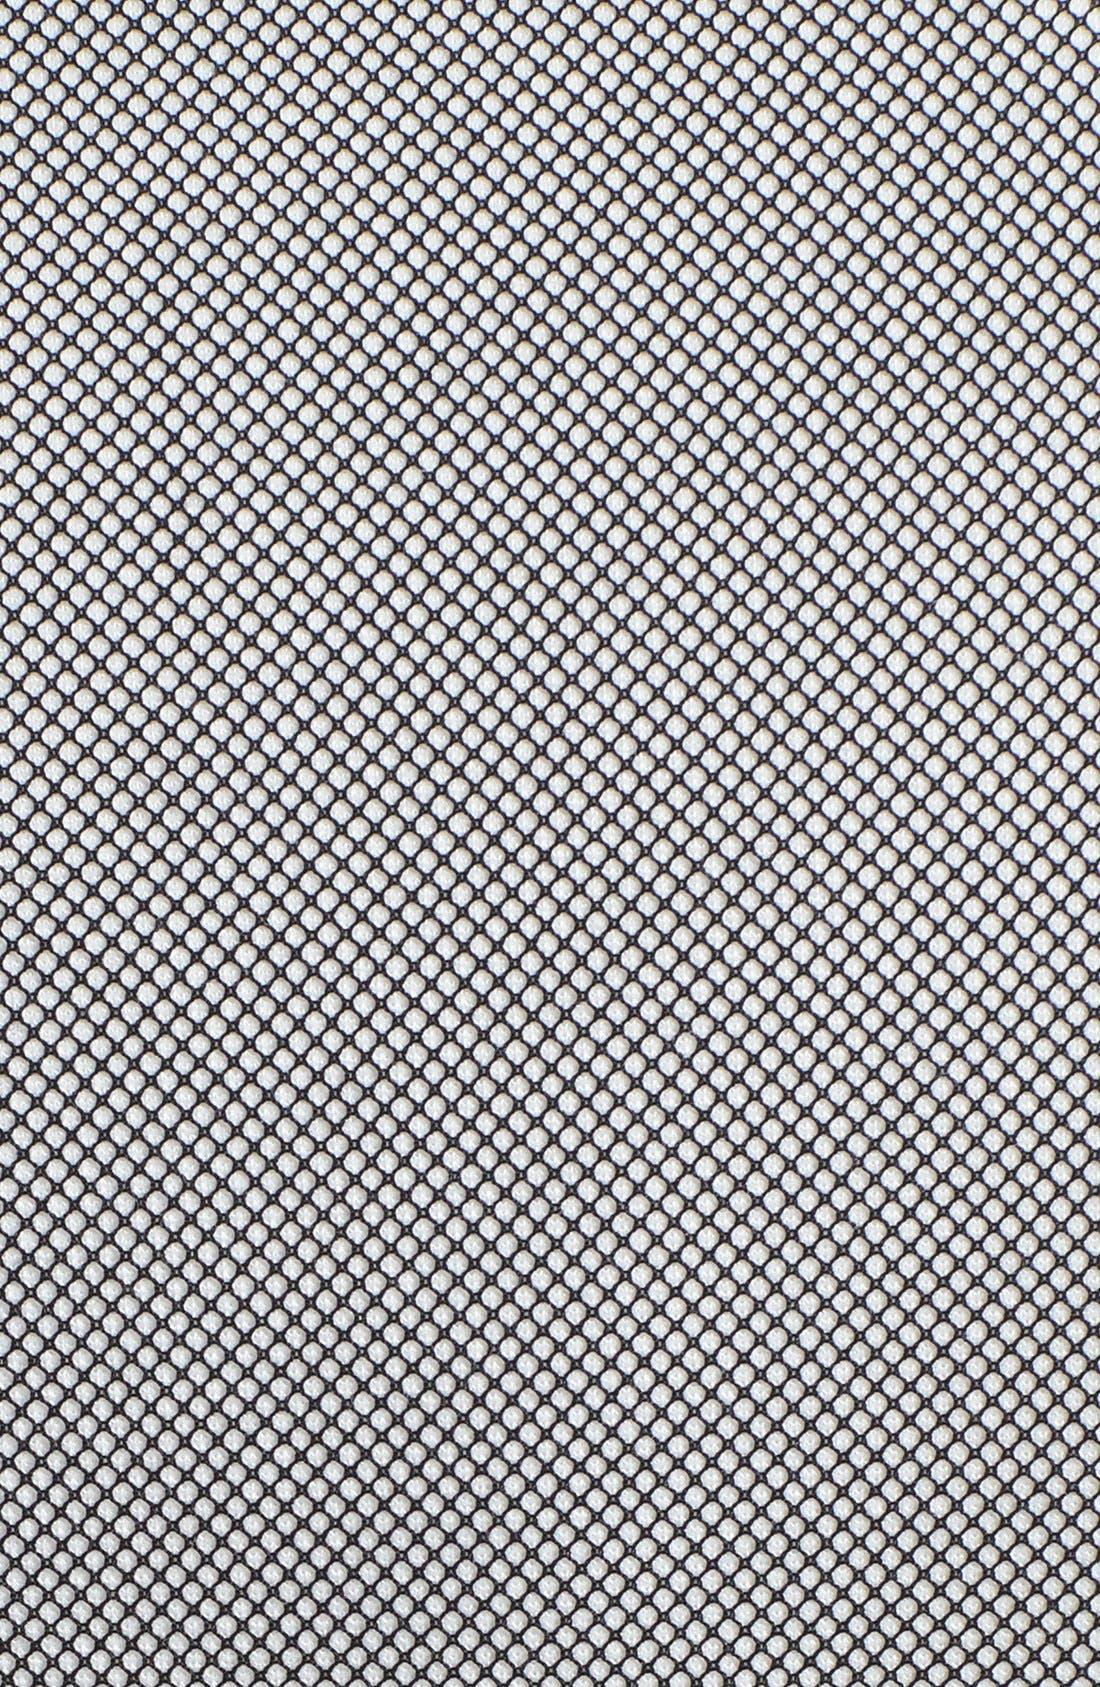 Alternate Image 3  - Trina Turk 'Milena' Mesh Panel Ponte Dress